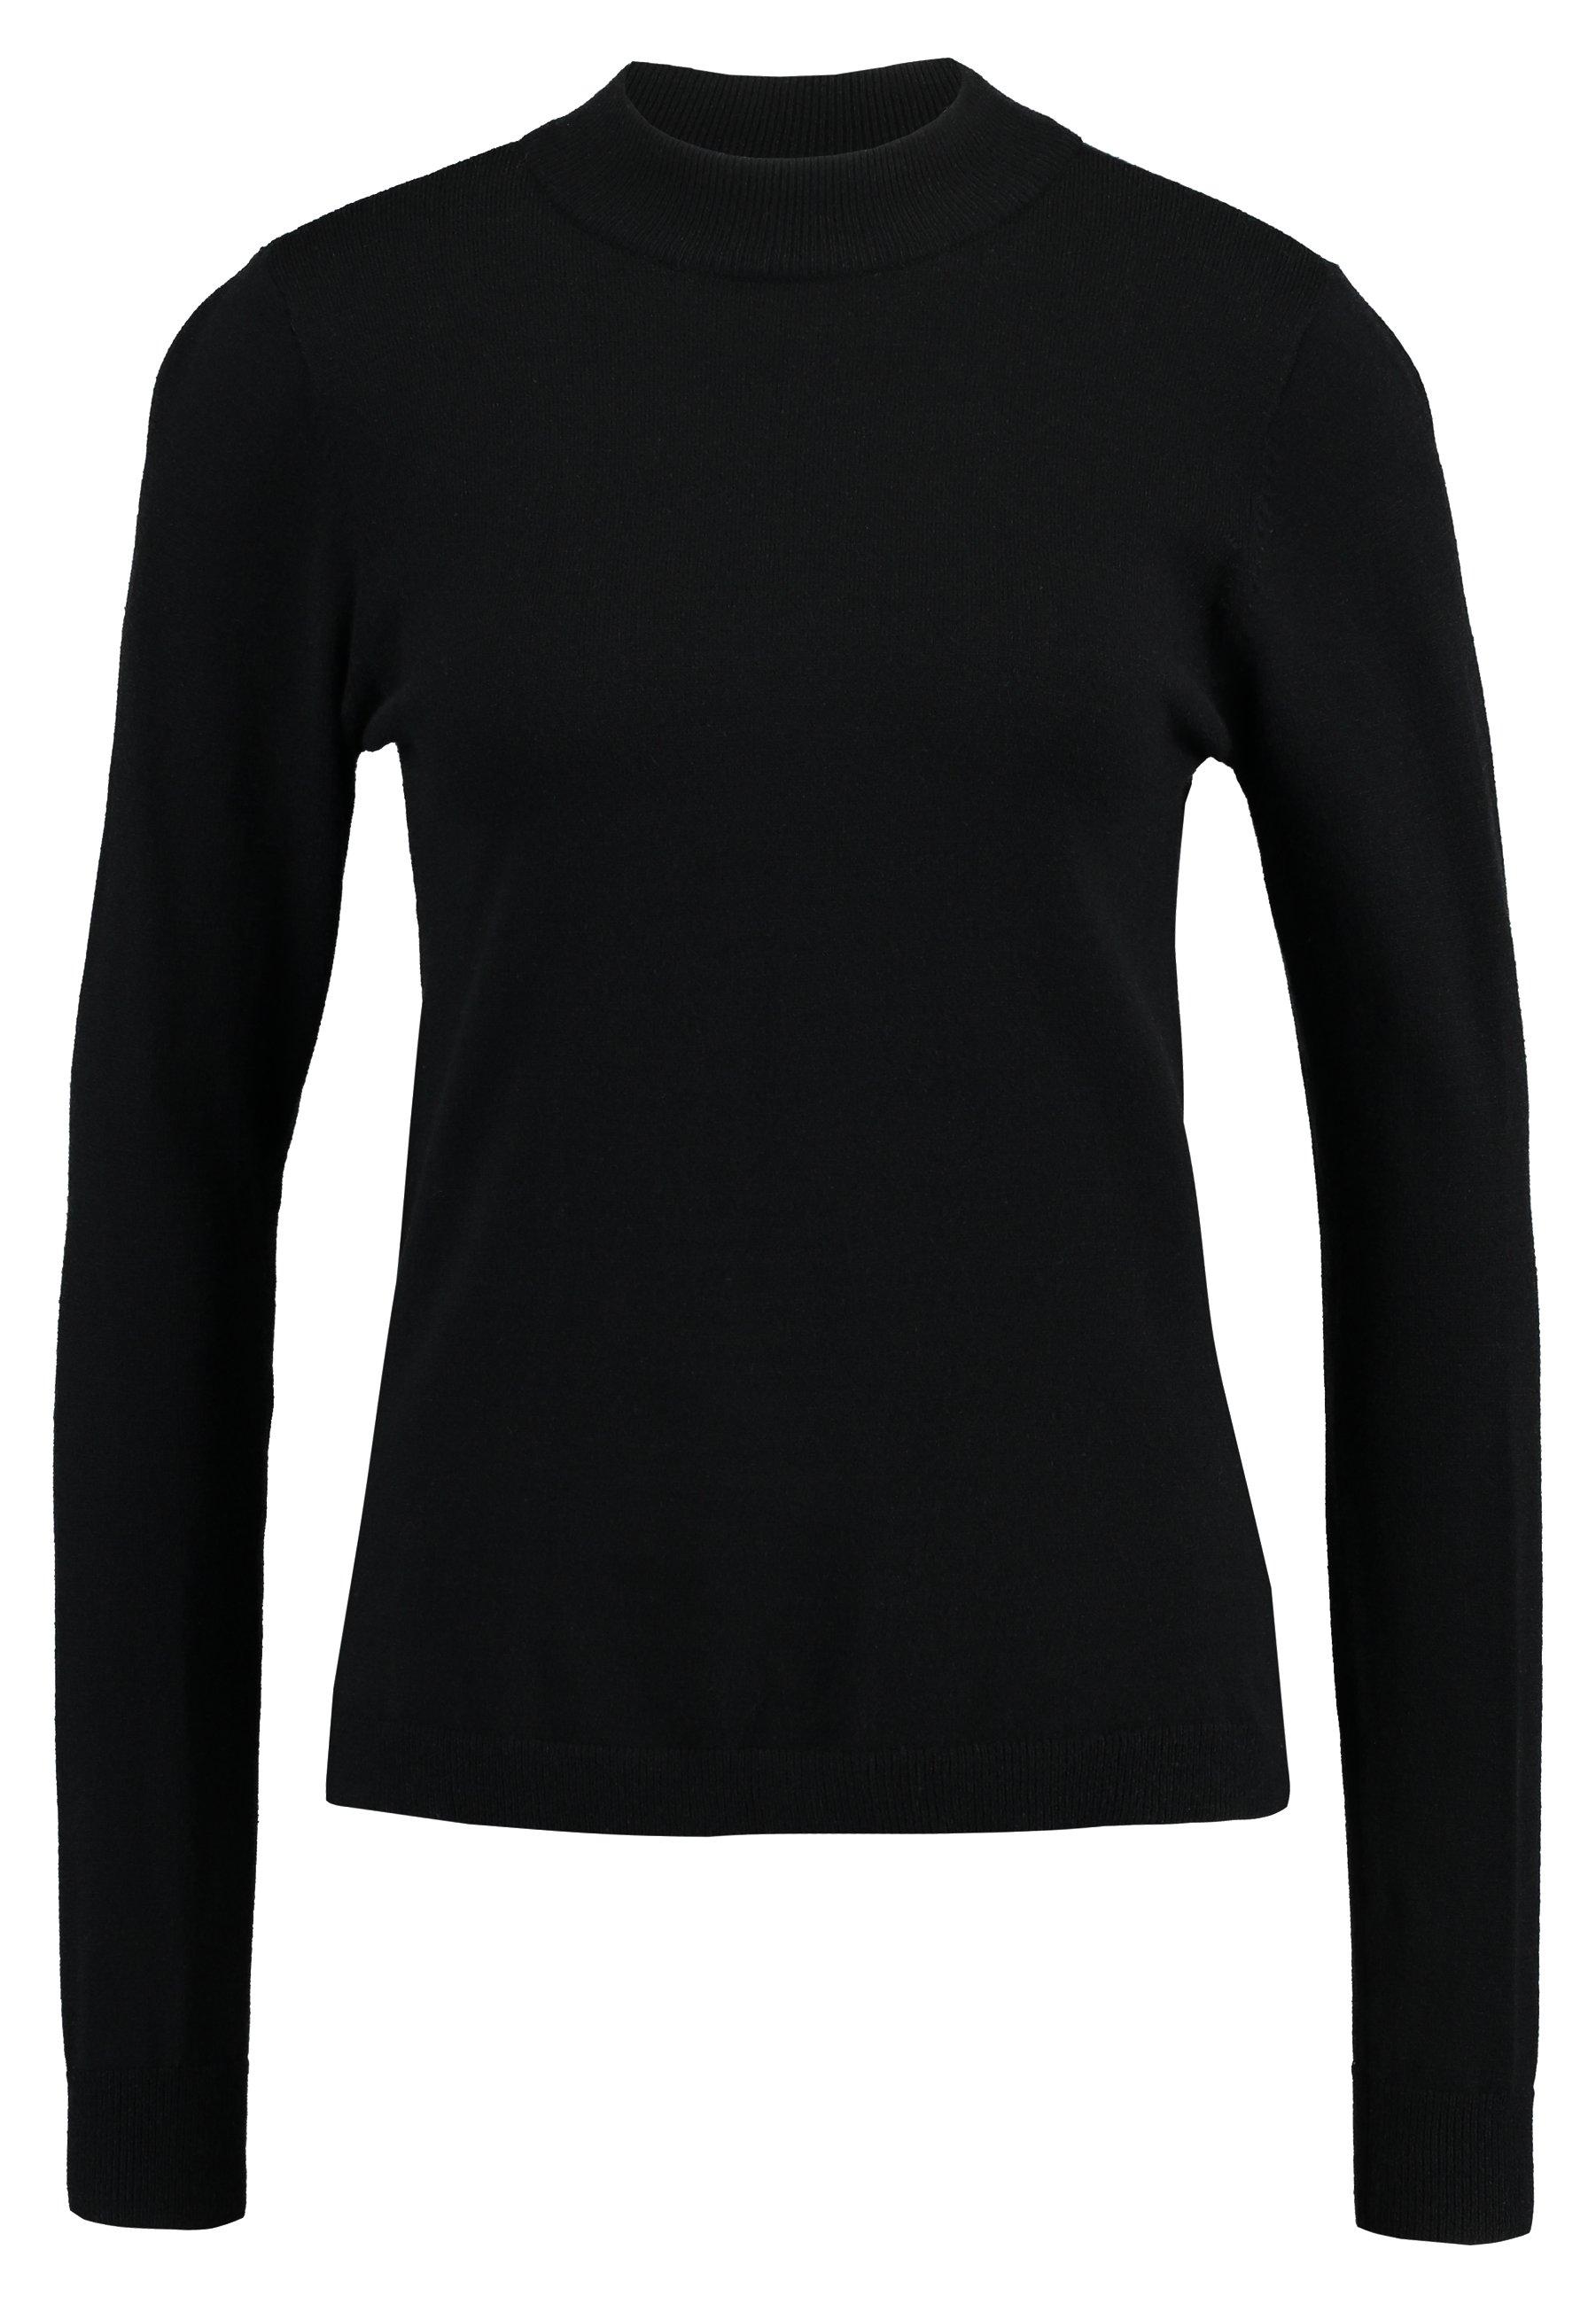 Object Objthess - Strikpullover /striktrøjer Black